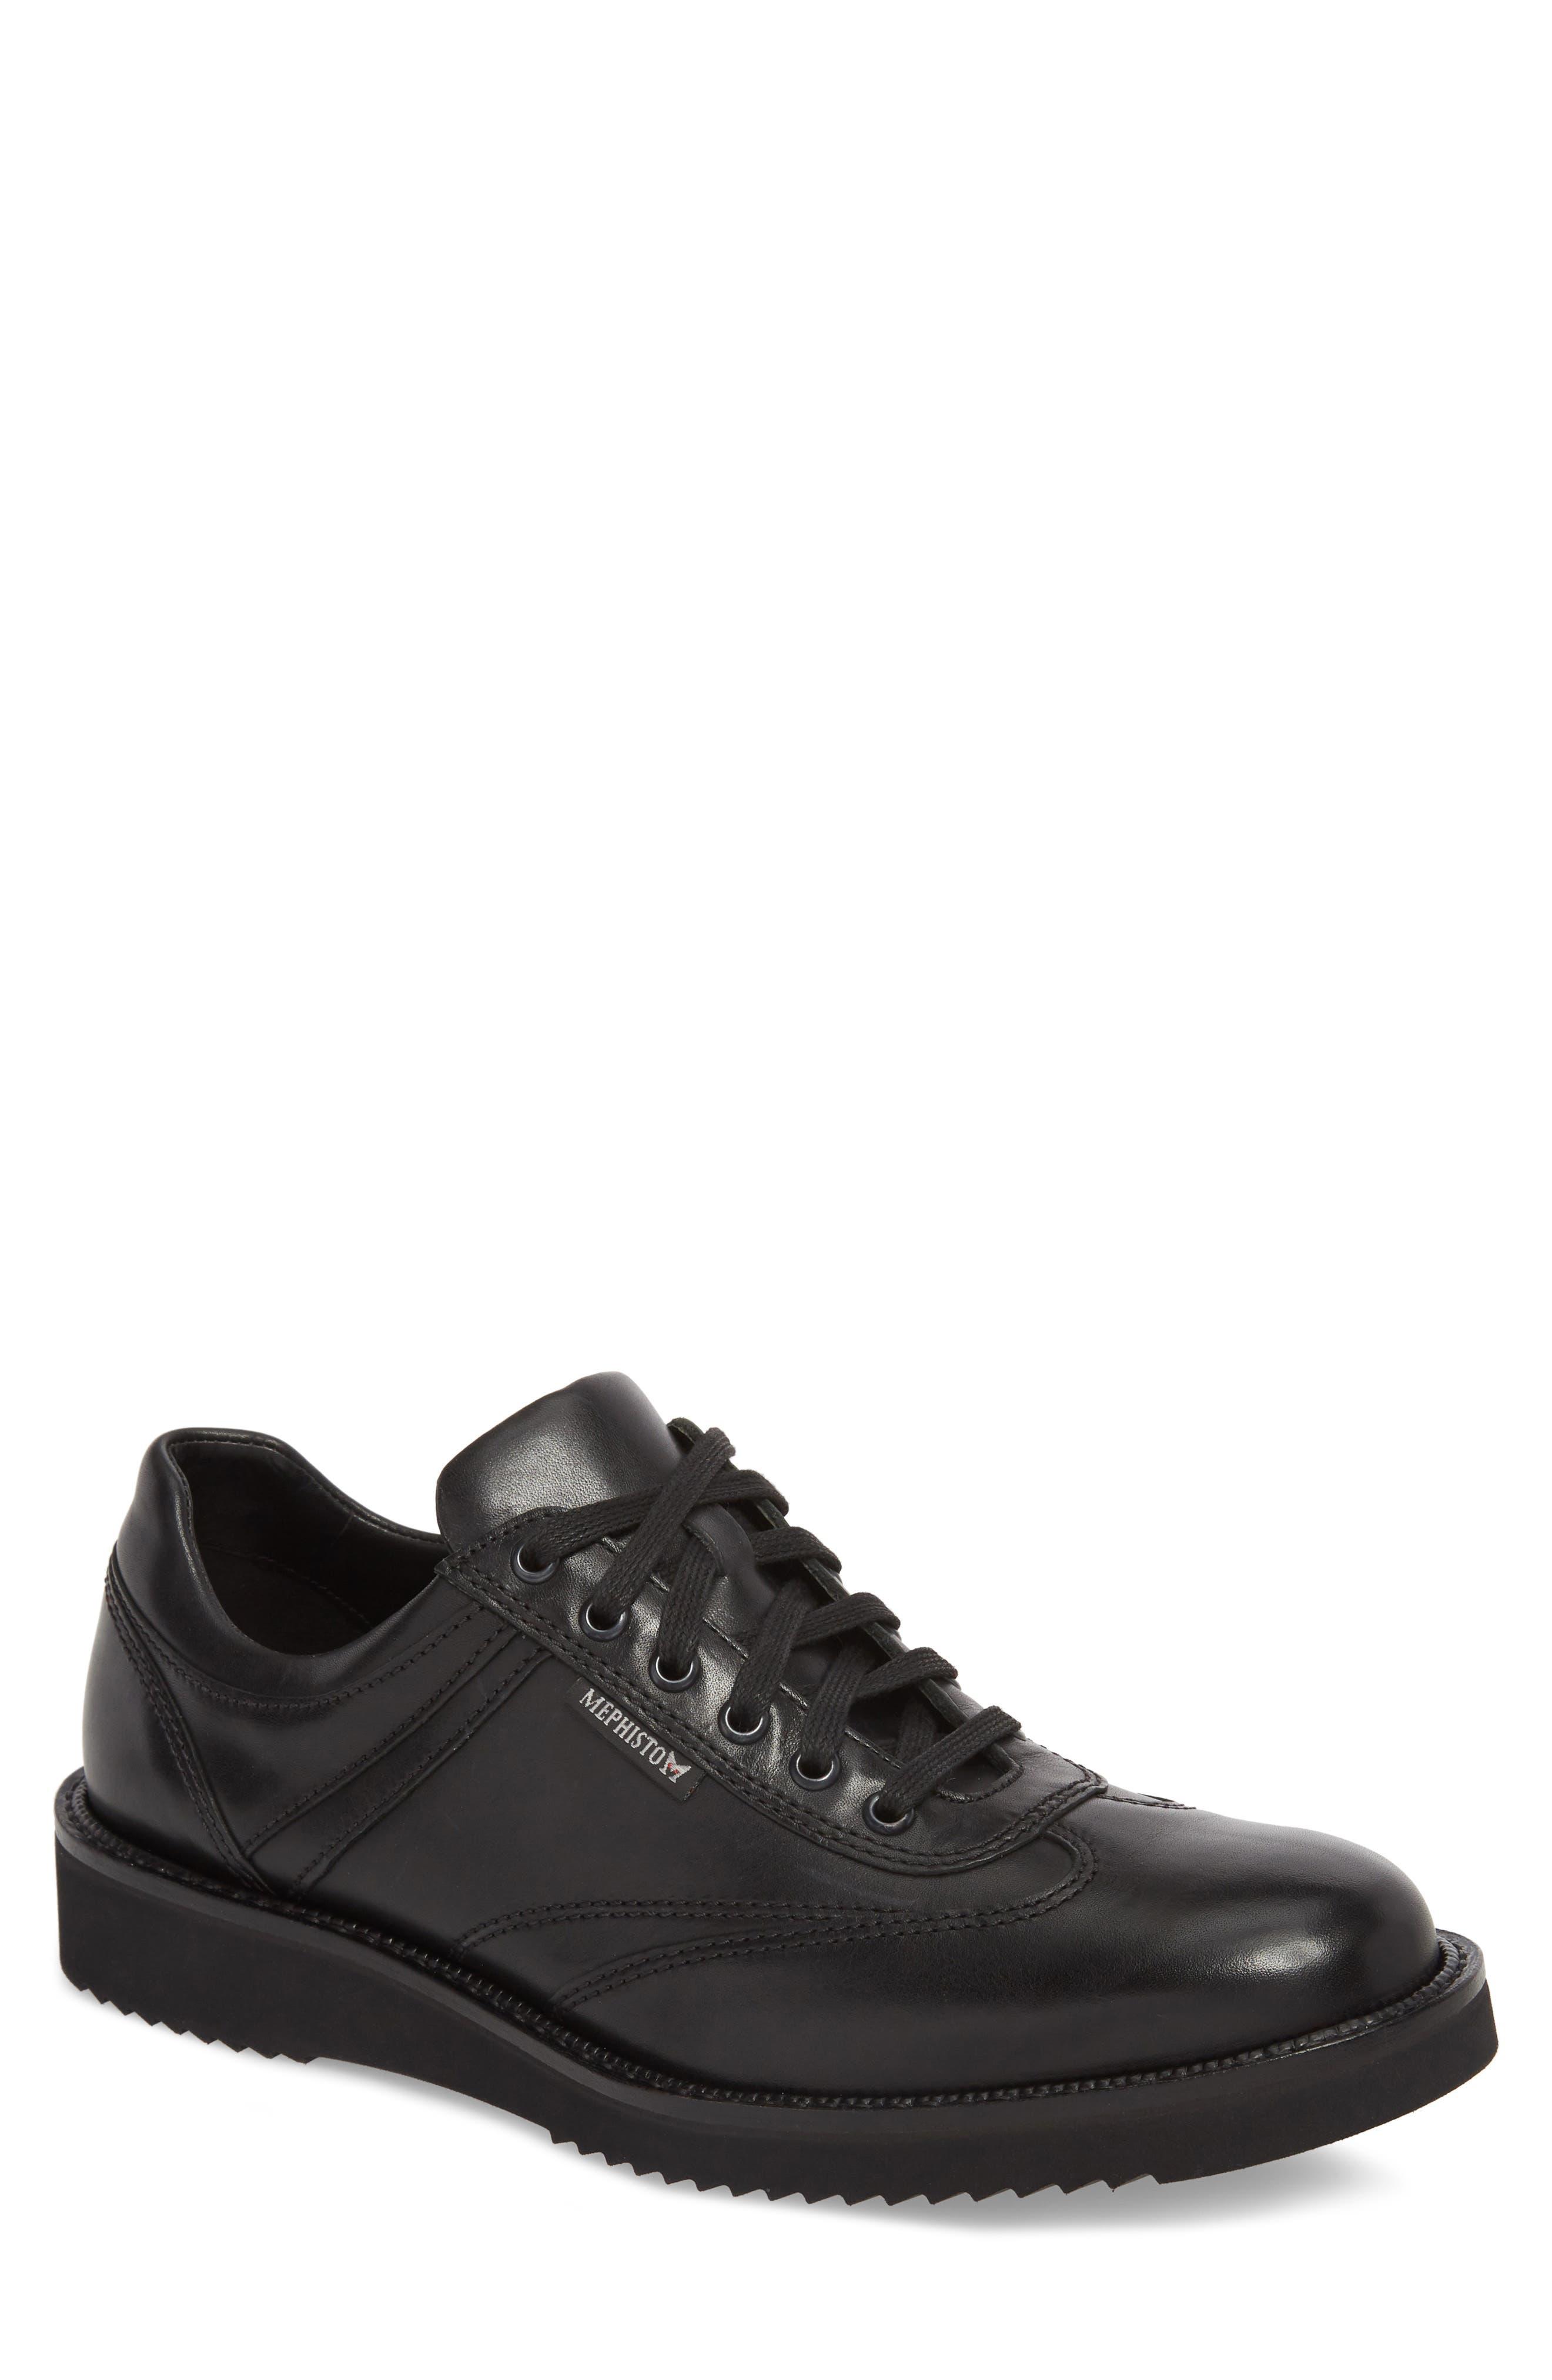 Adriano Sneaker,                             Main thumbnail 1, color,                             001